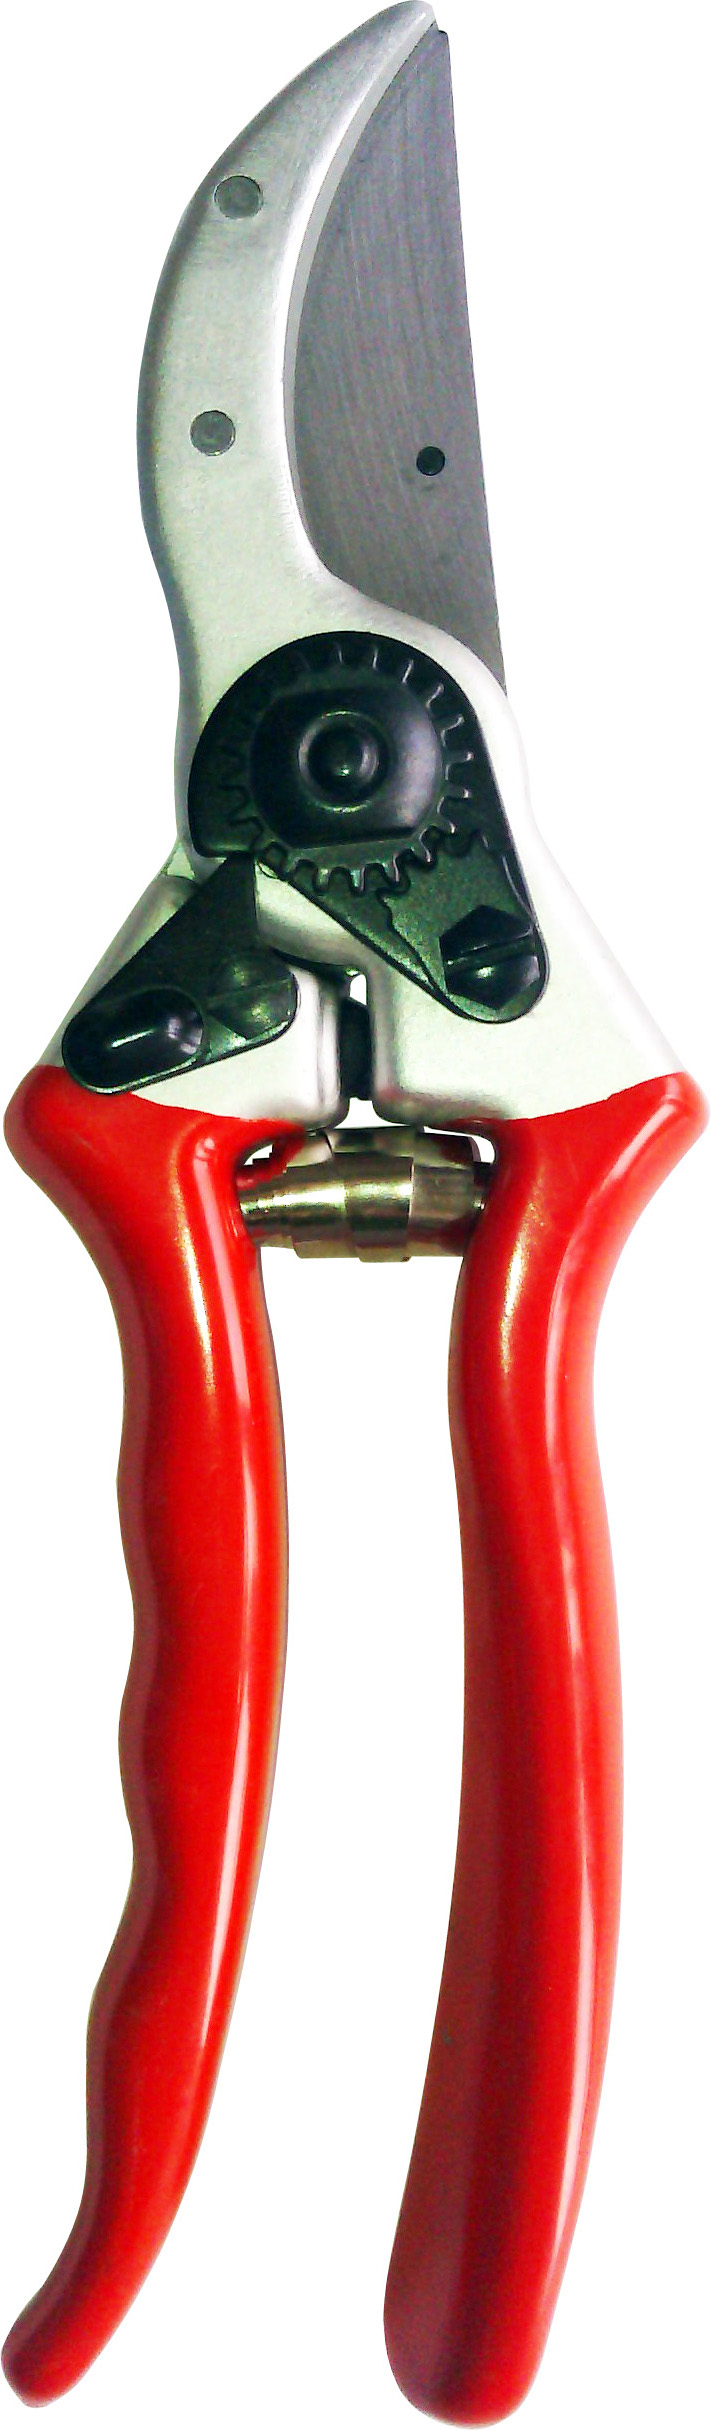 Zenport QZ402 Classic Professional Pruner, 1-Inch Cut, 8.5-Inch Long